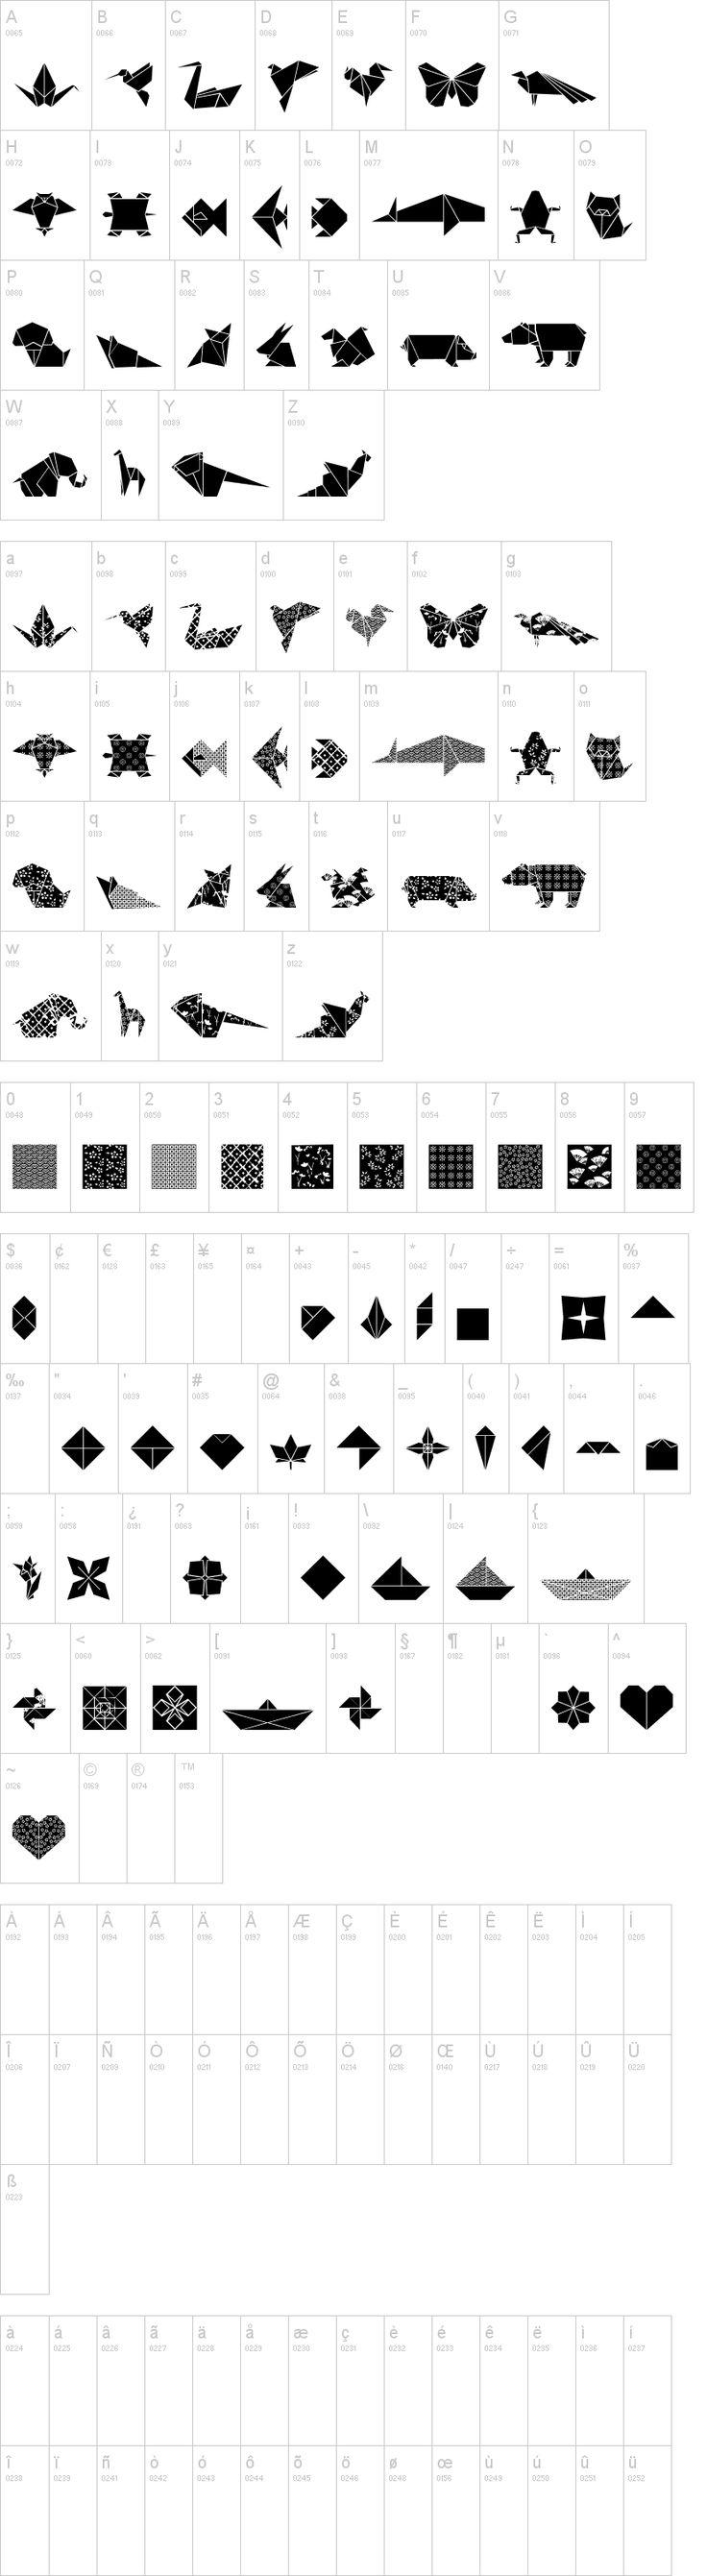 Origami on dafont.com ... I soooooo need this!!! Love It!